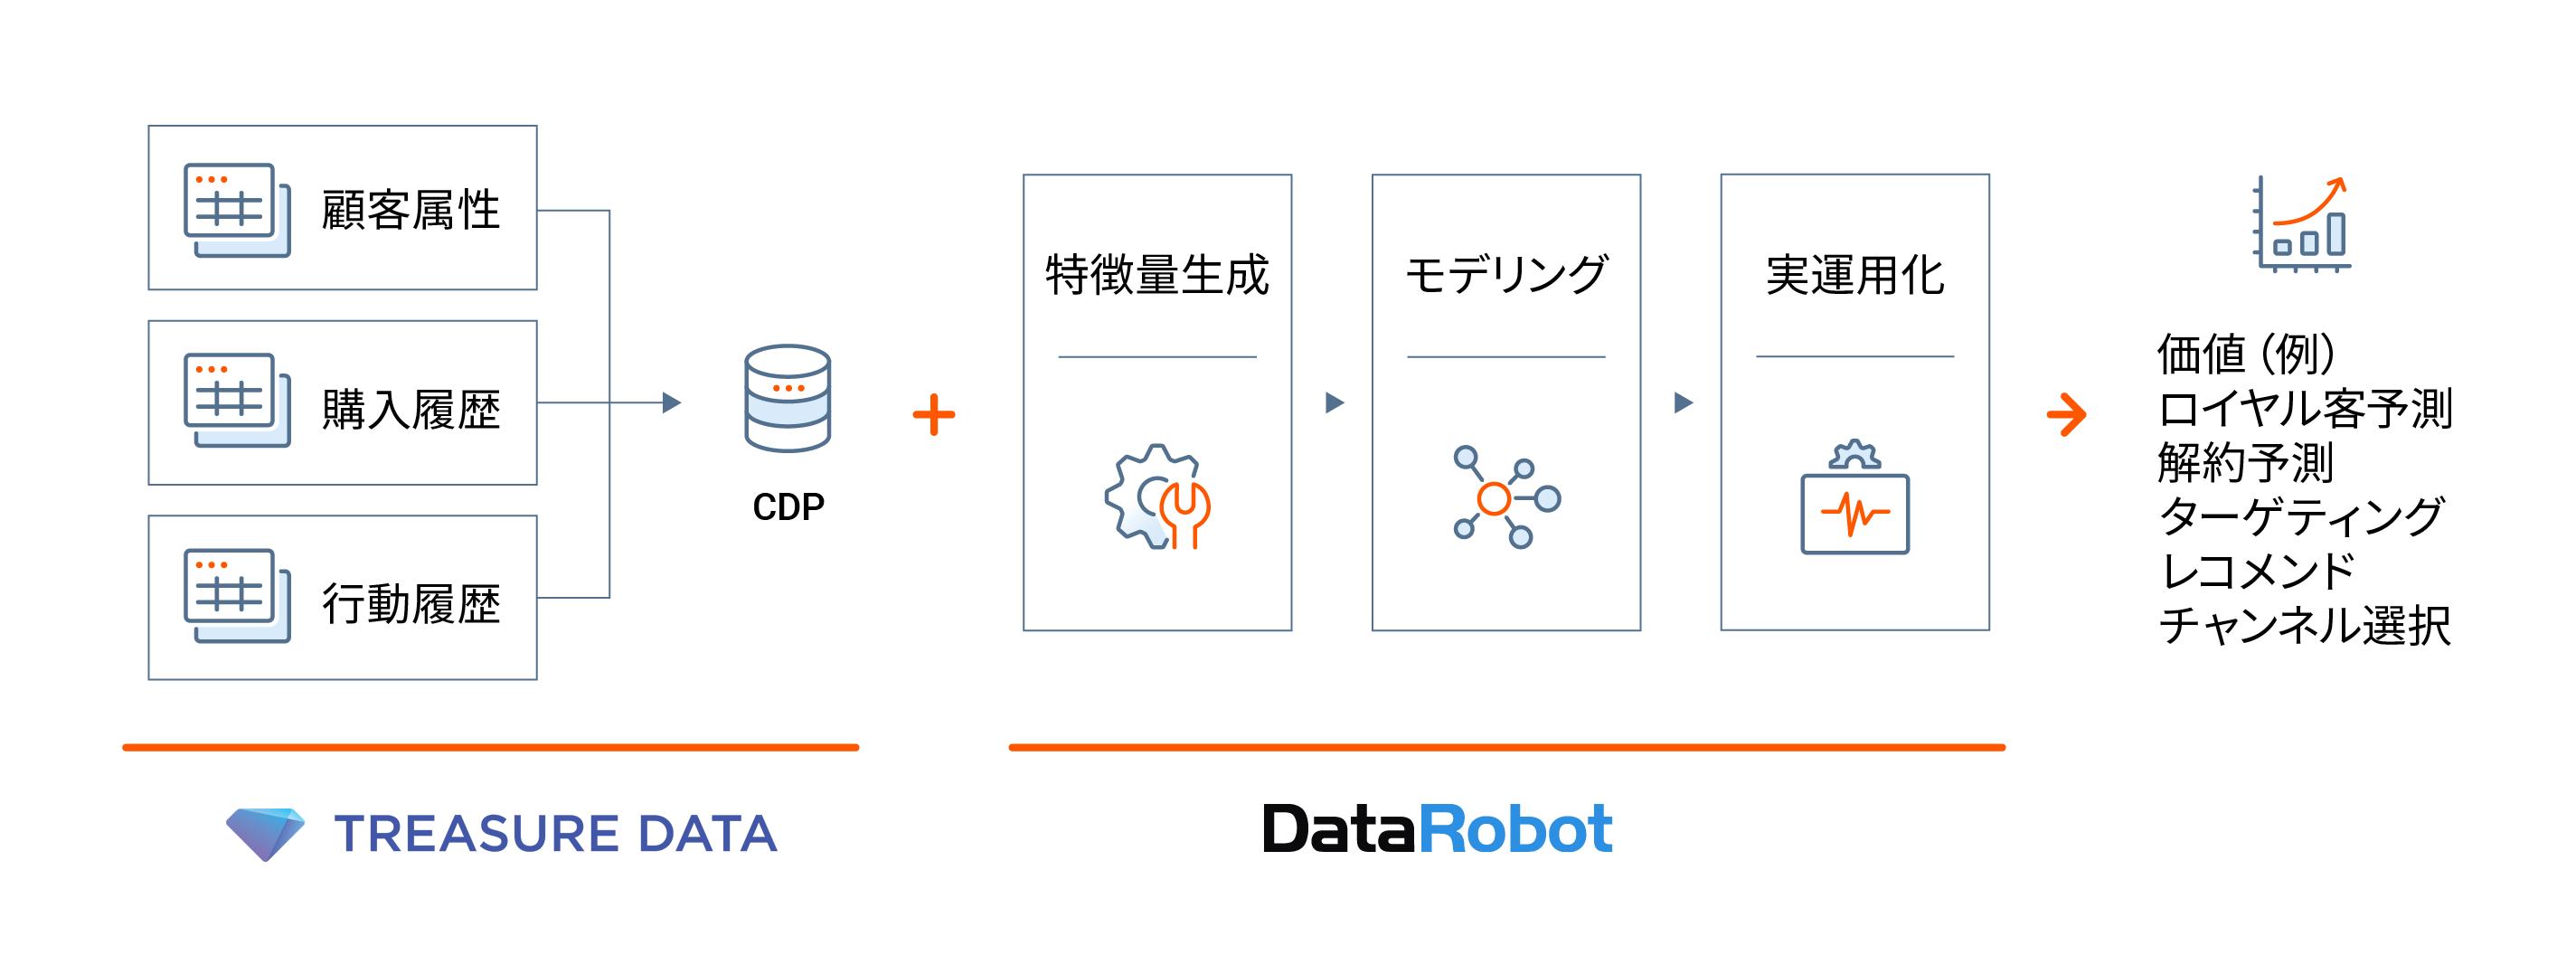 DataRobot Arm Treasure Data Graphics v3.0